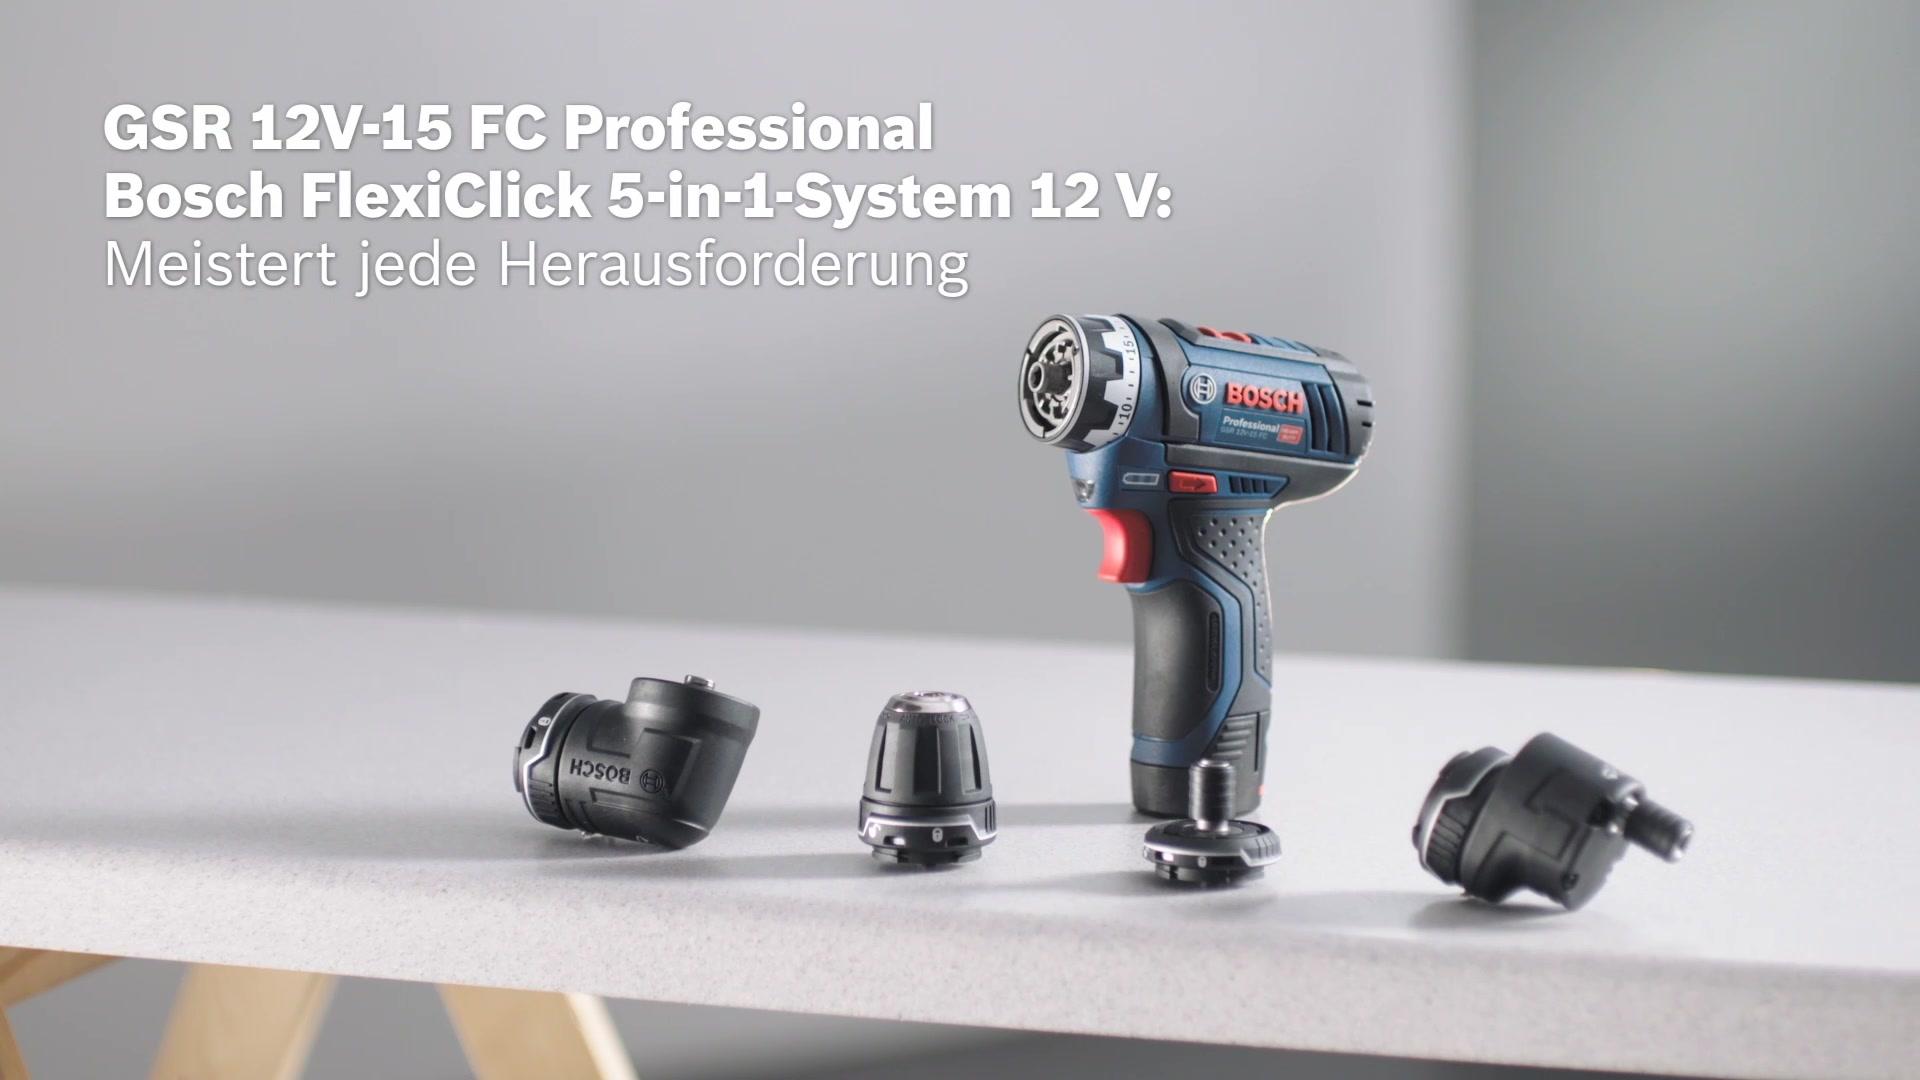 Gsr 12v 15 Fc Akku Bohrschrauber Bosch Professional